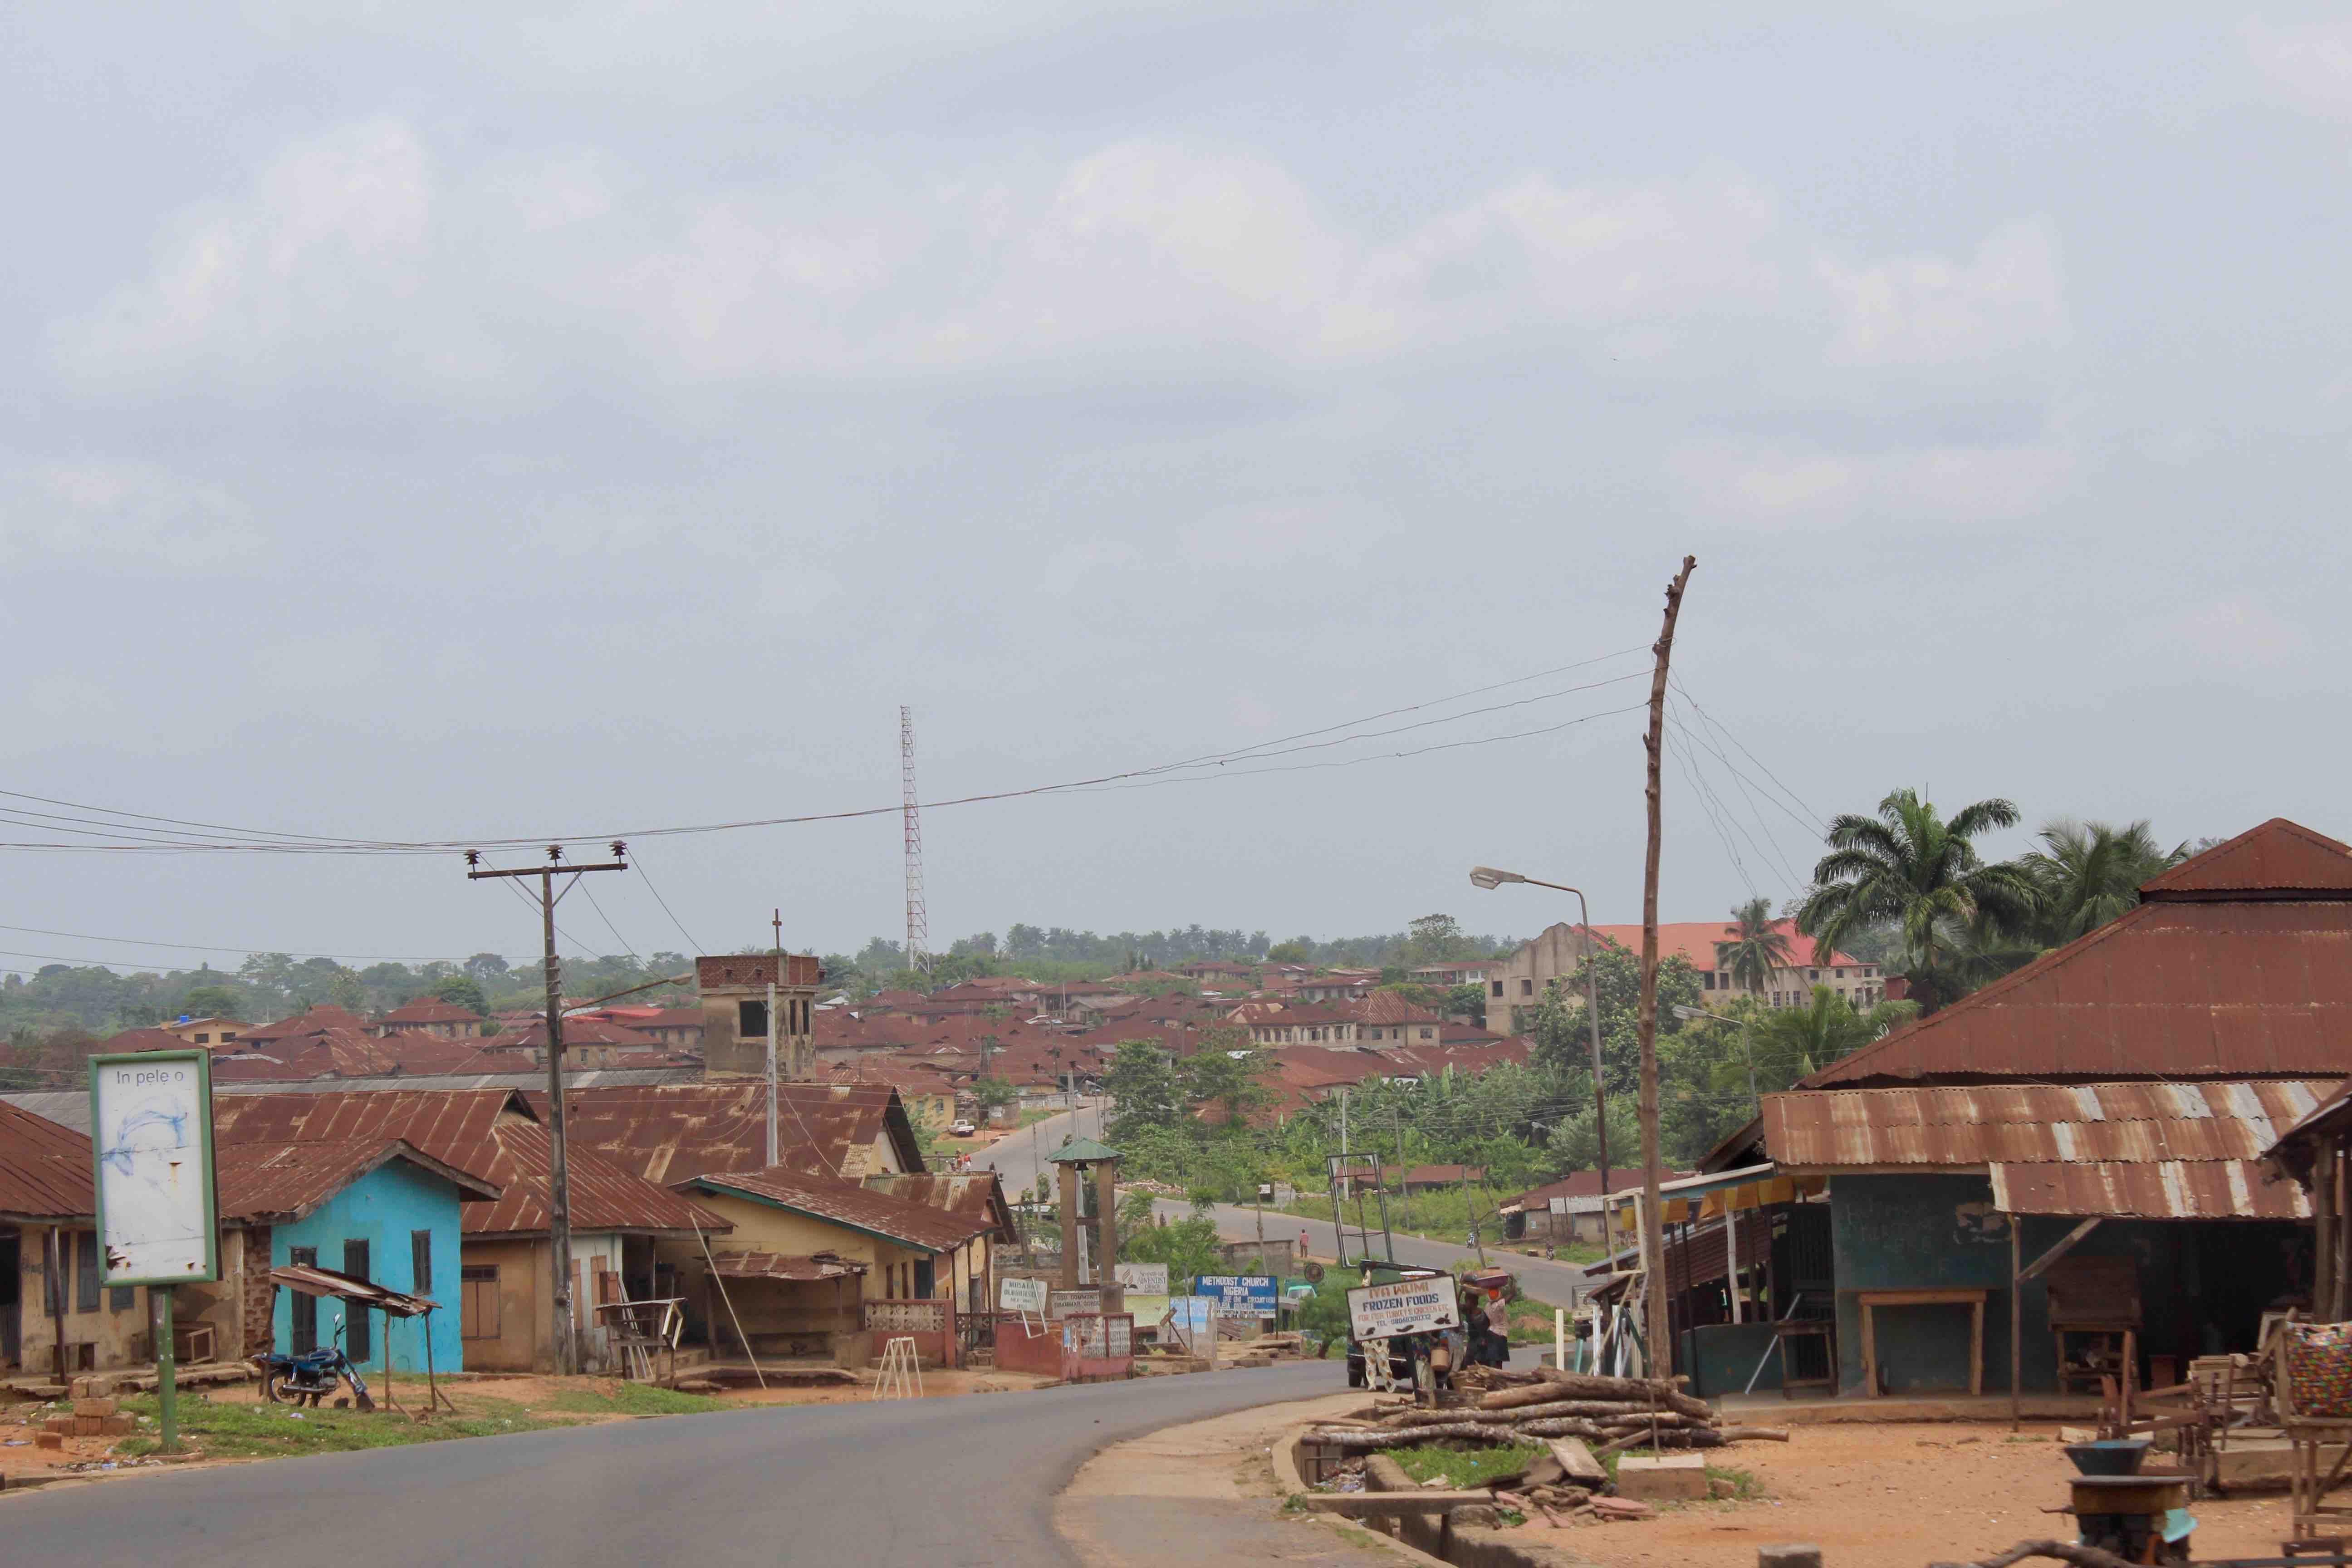 Oke Omi Osu, Osun State, Nigeria. #JujuFilms